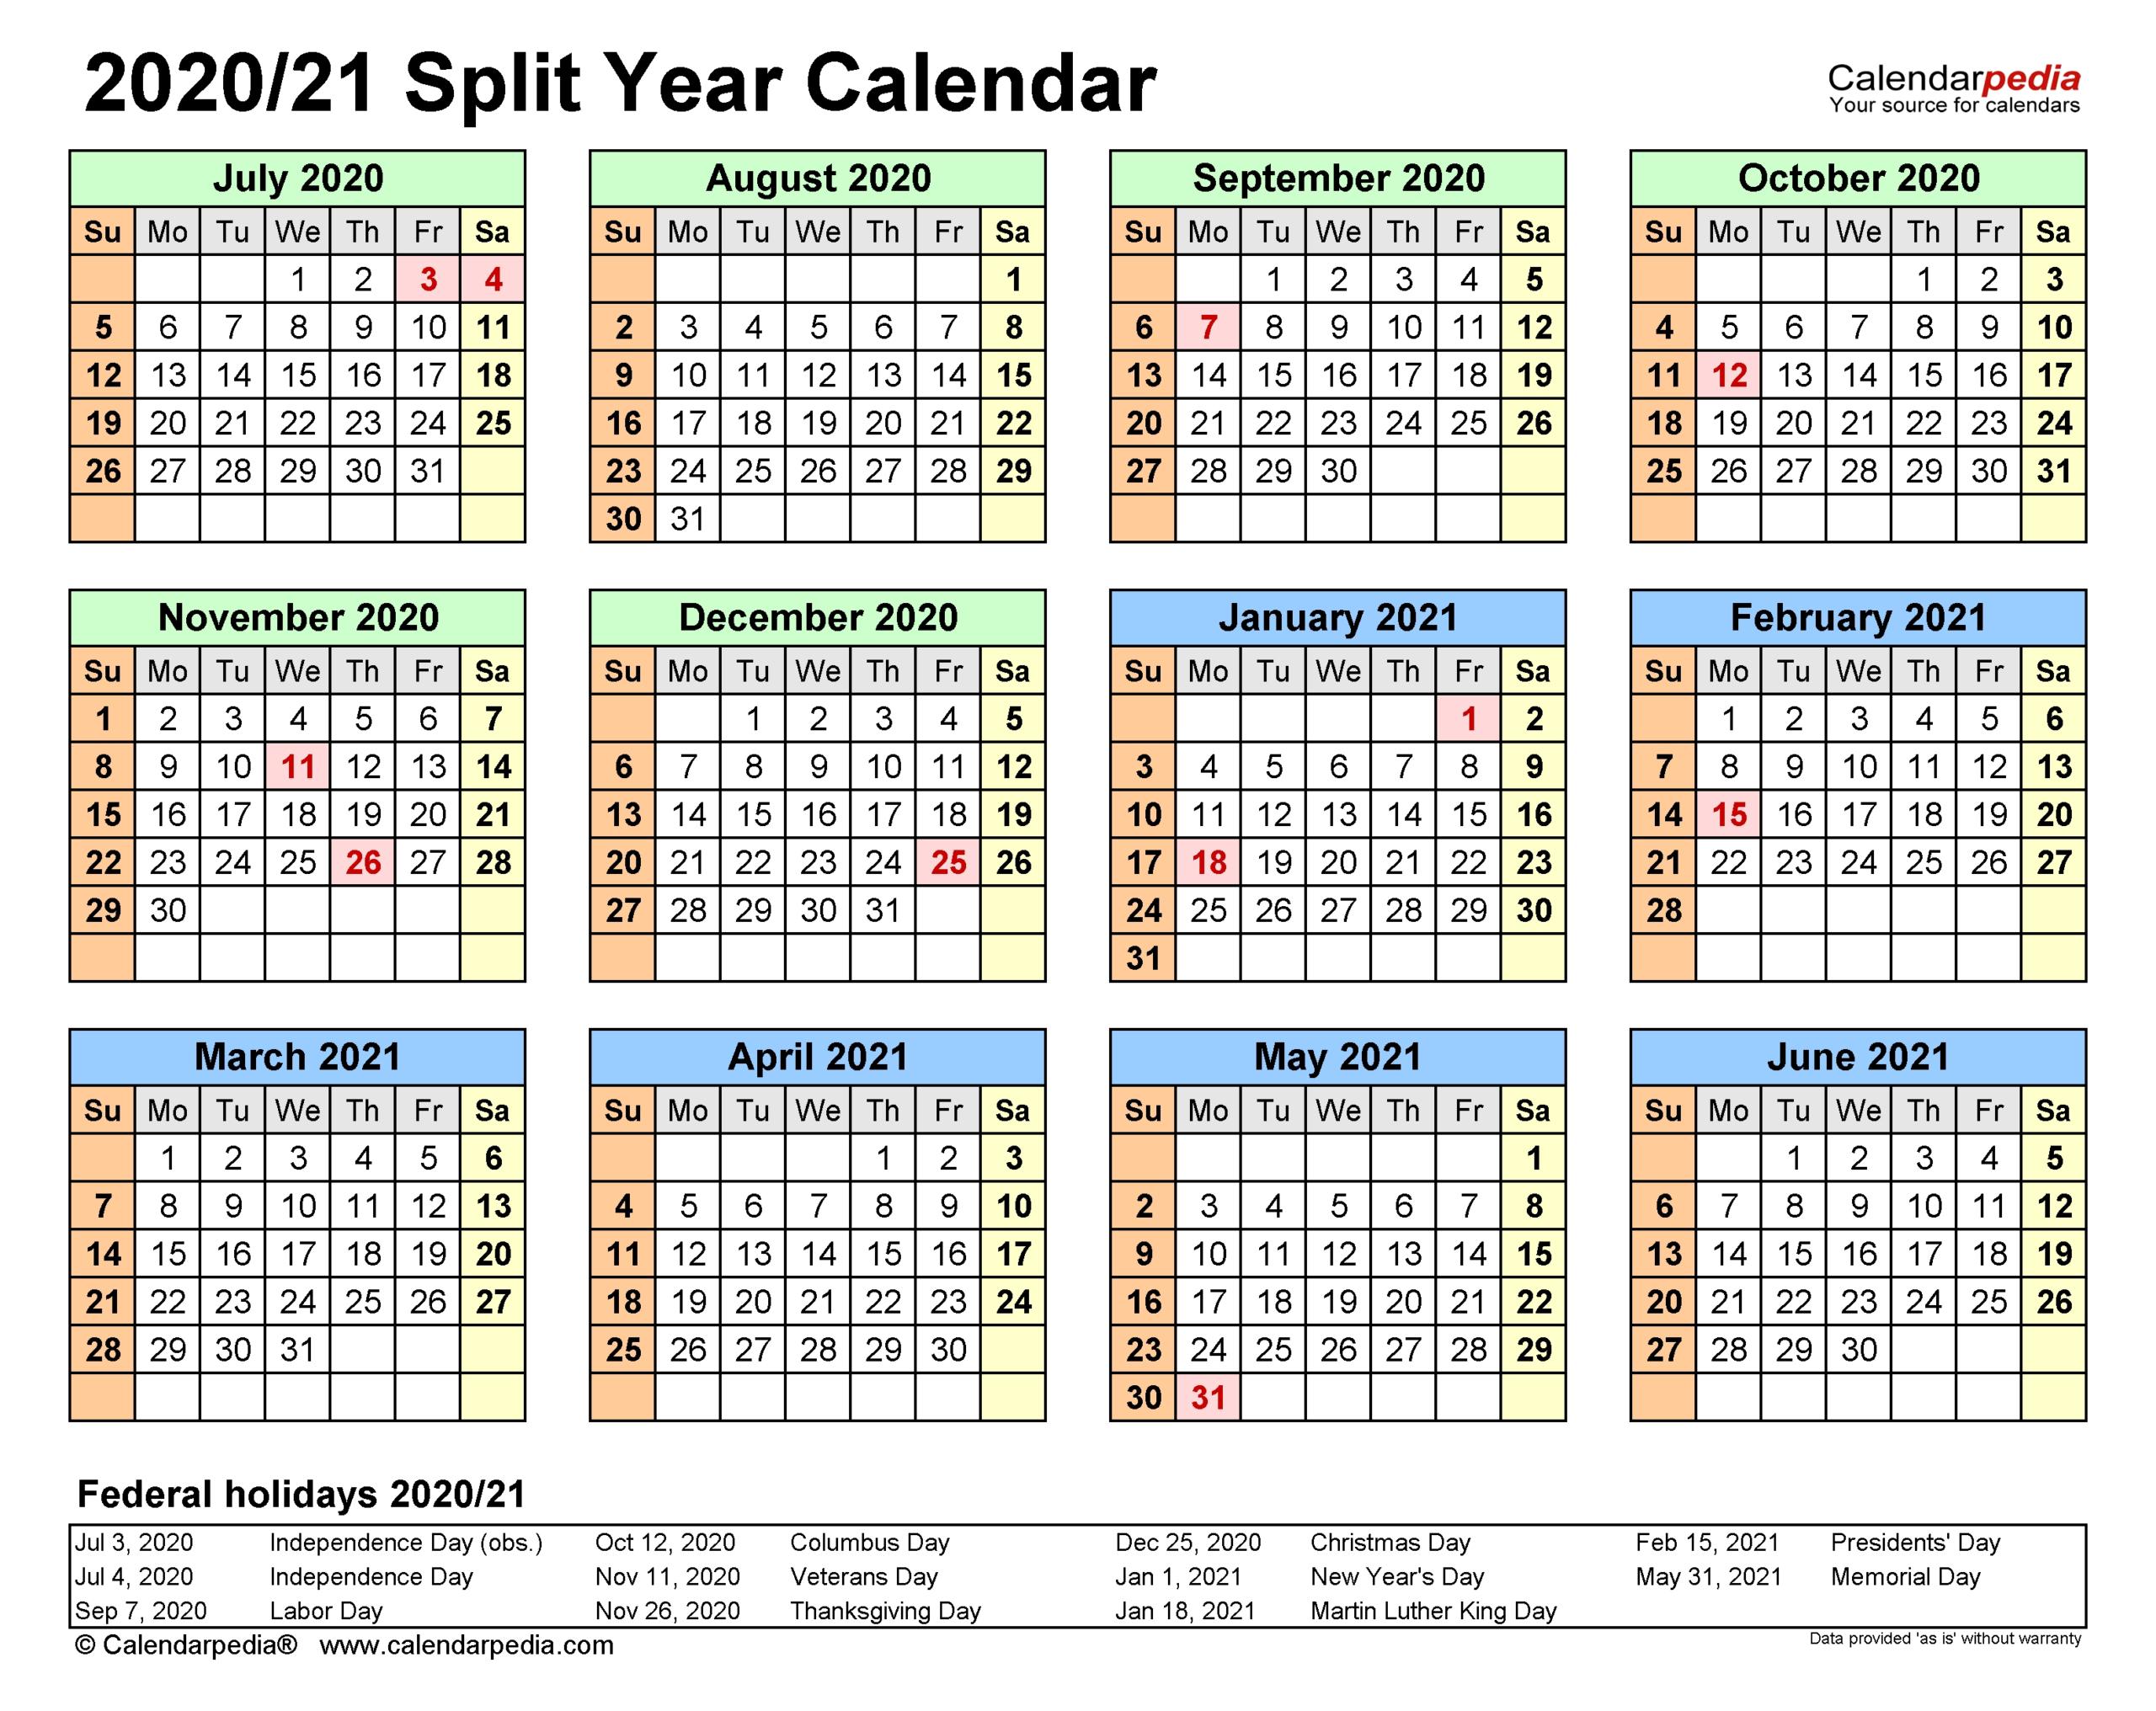 Depo Provera Calendar 2021 | Calendar Printables Free Blank  2021 Depo Provera Dosing Calendar